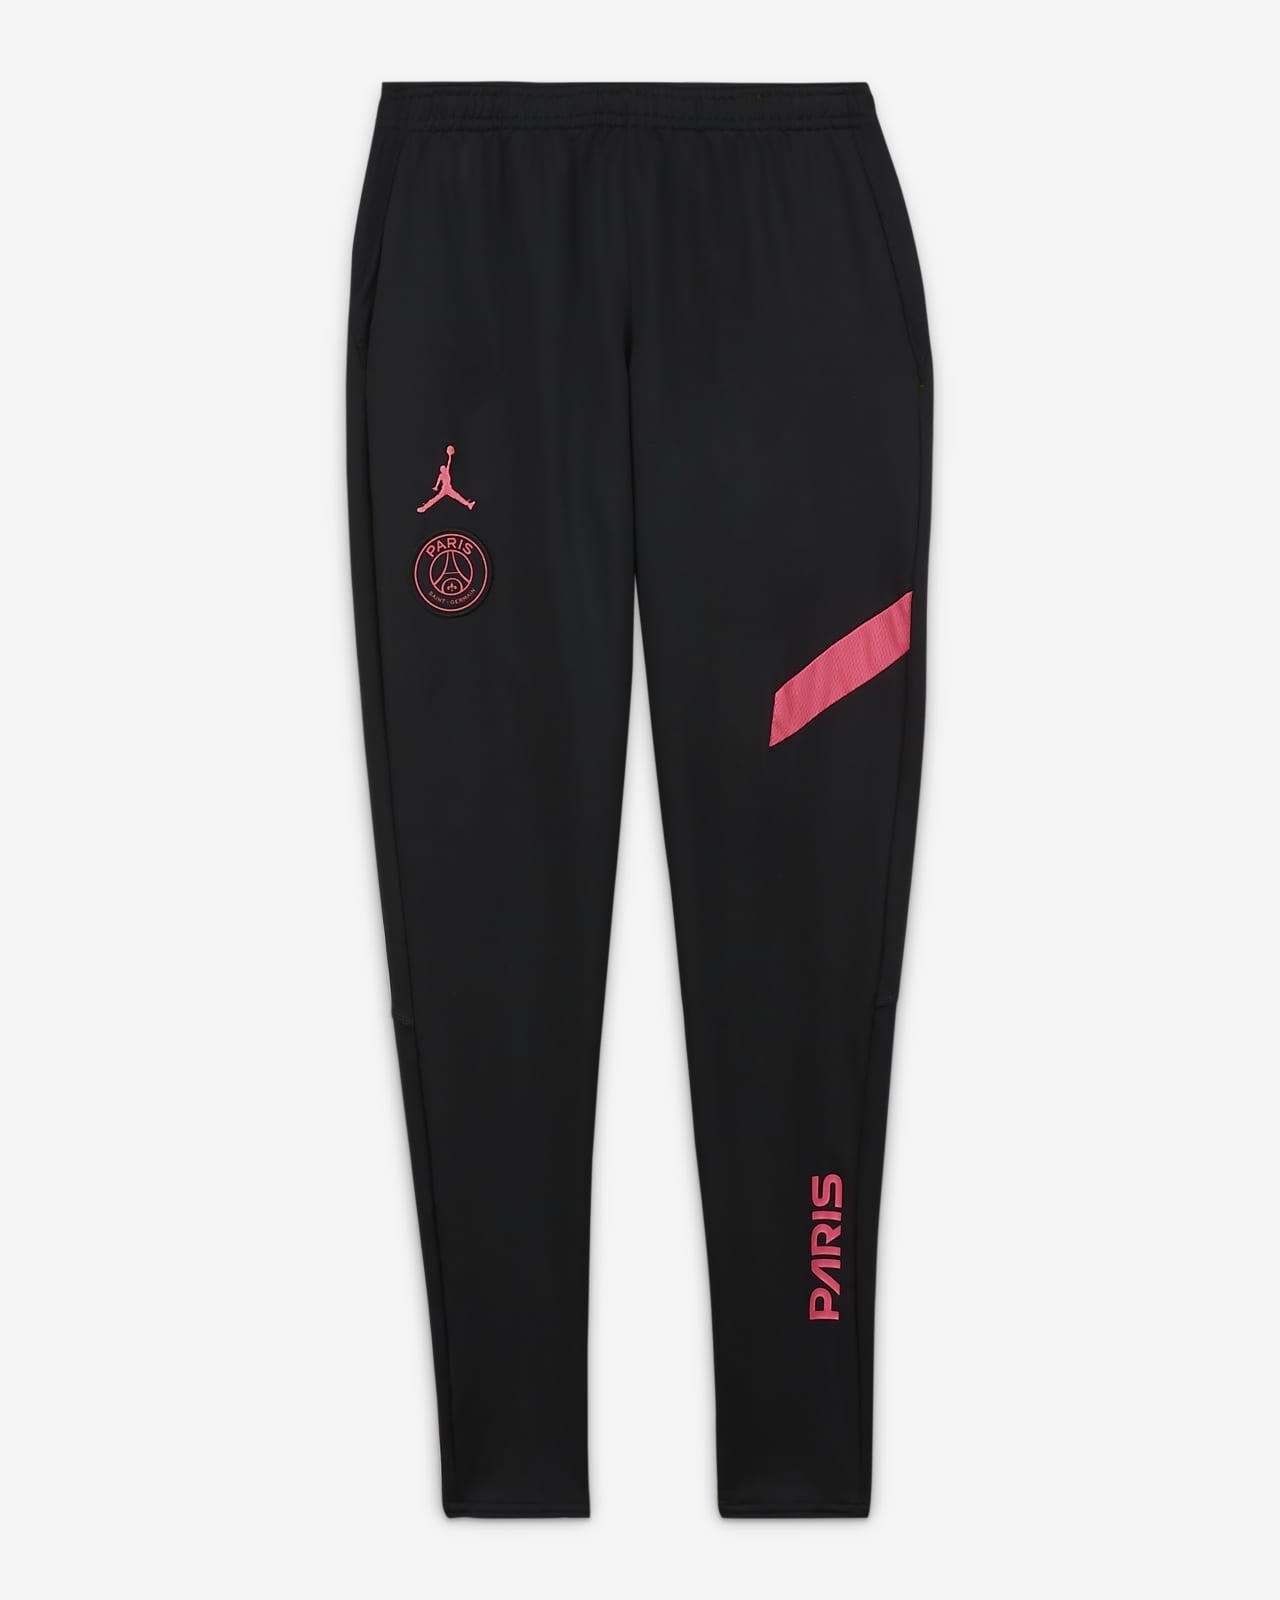 Paris Saint-Germain Academy Pro Women's Knit Football Pants